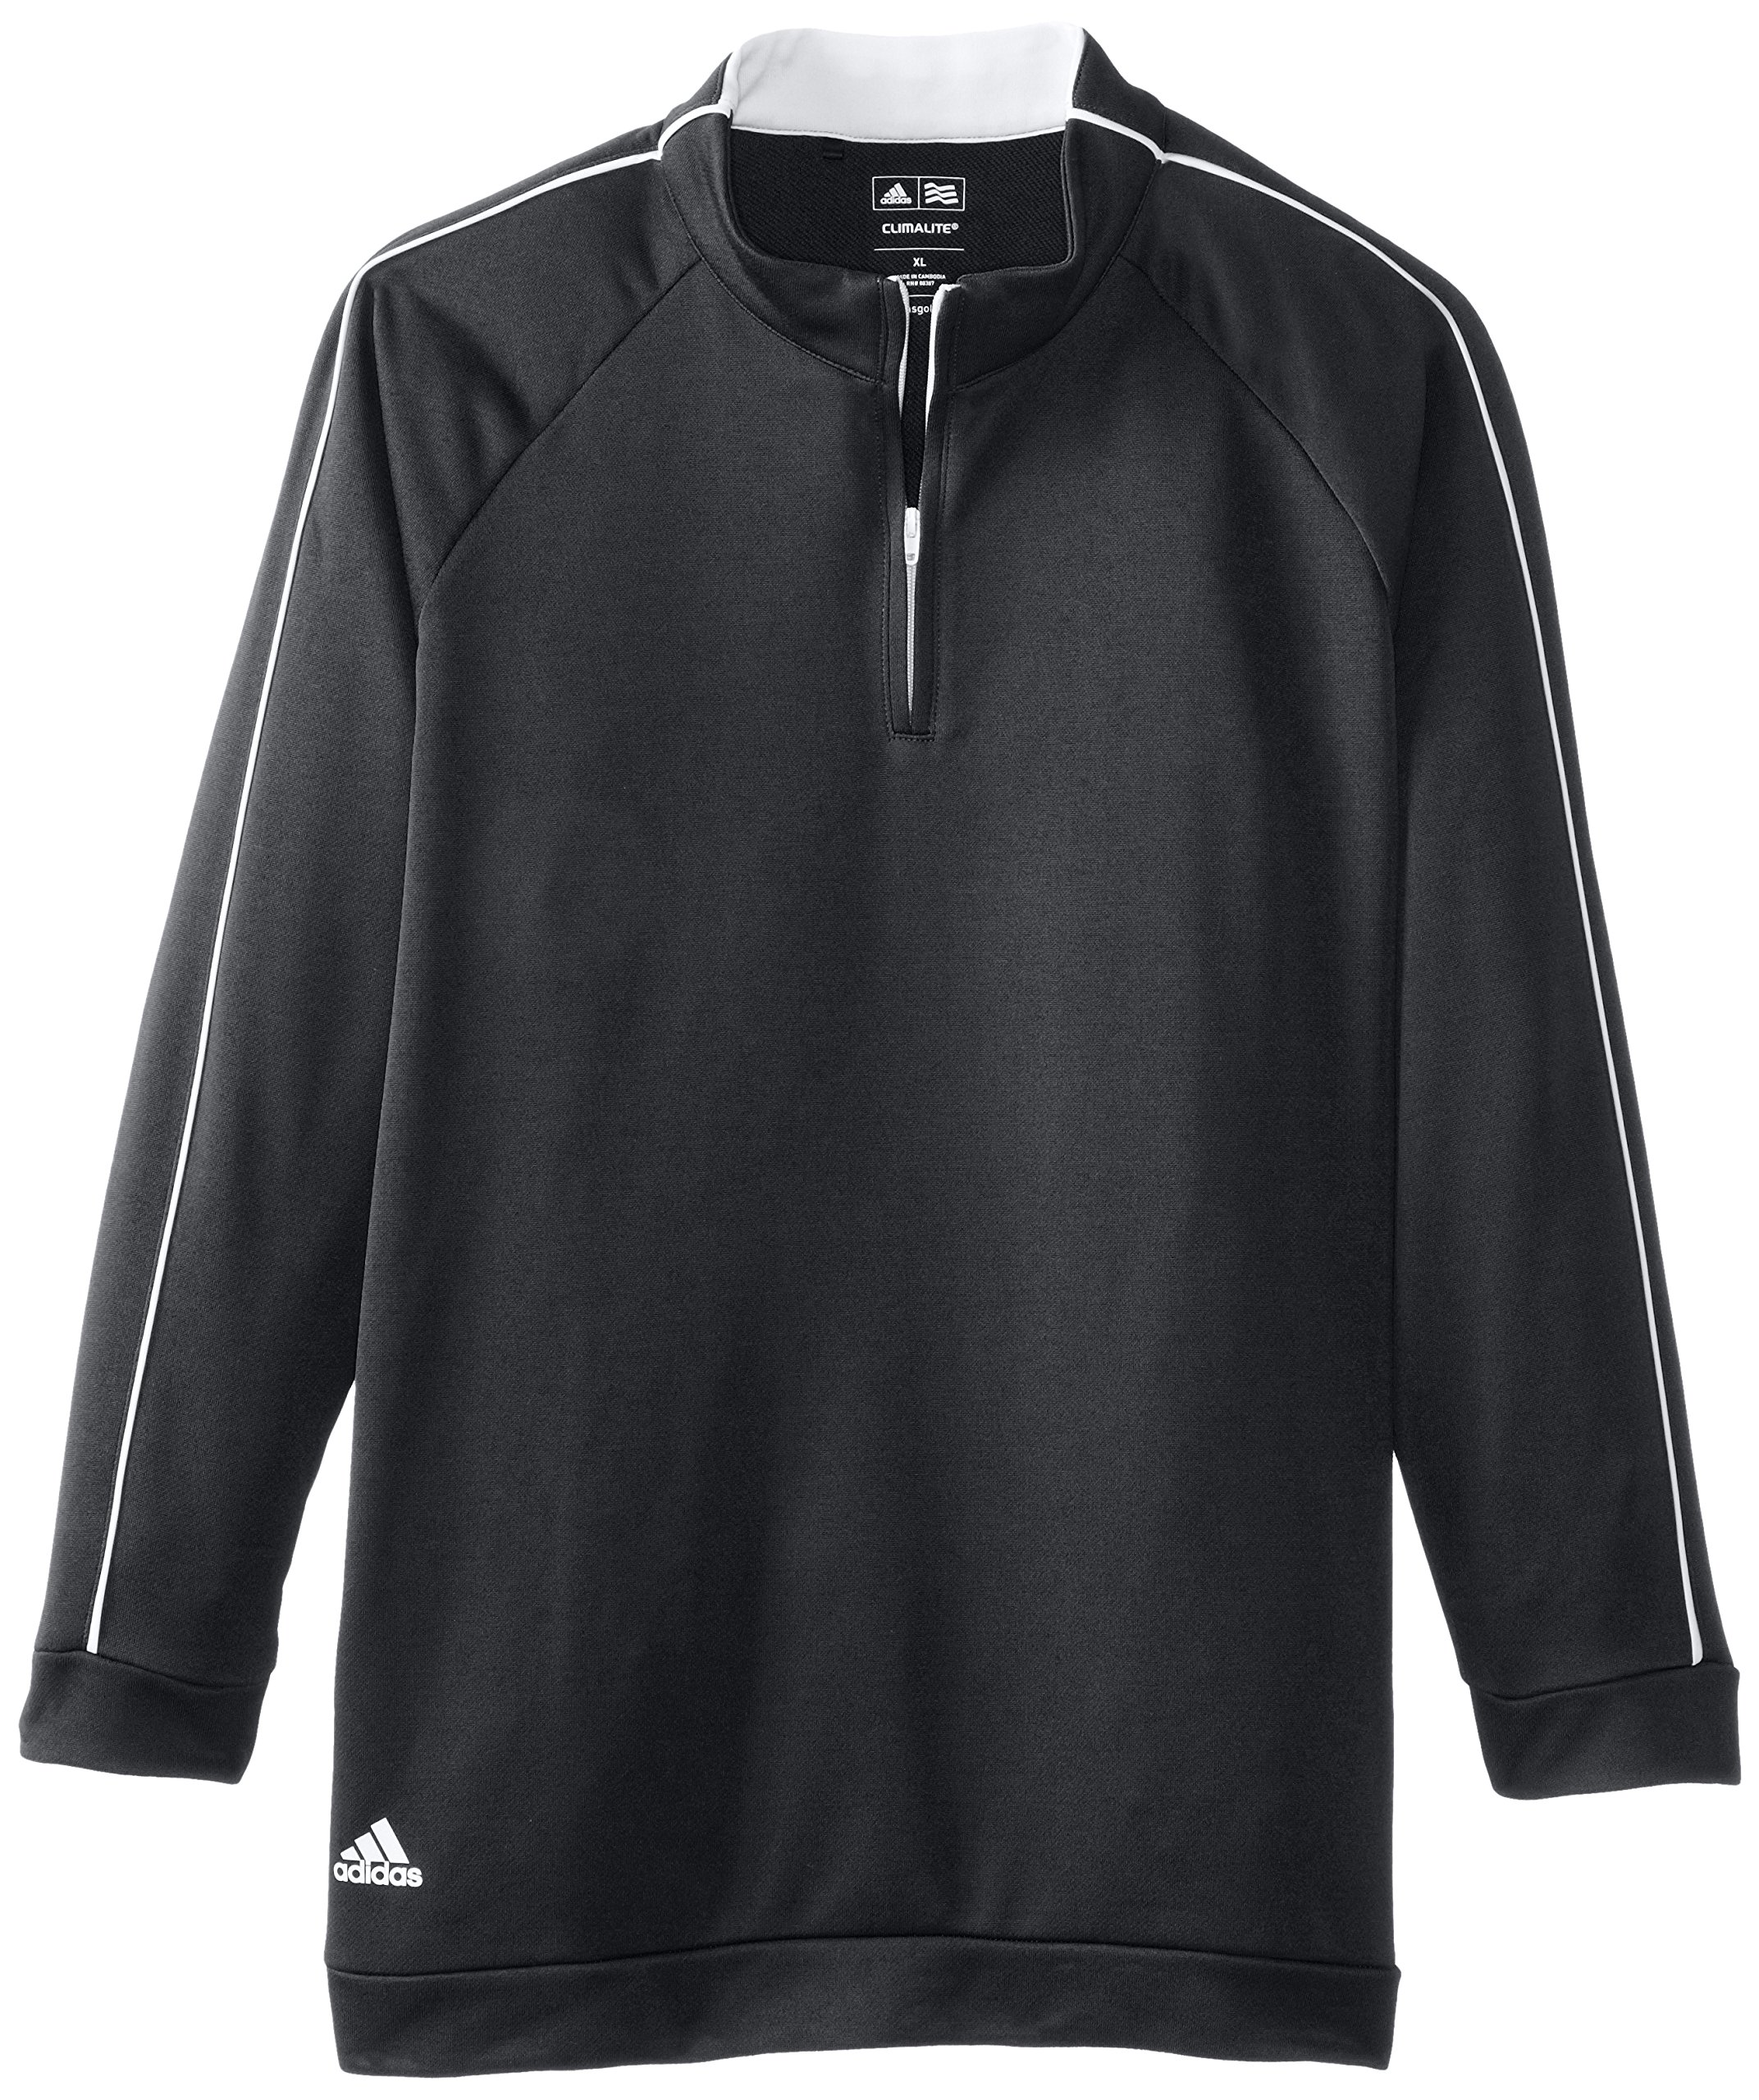 adidas Golf Boy's 3-Stripes Piped 1/4 Zip Jacket, Black/White, Medium by adidas